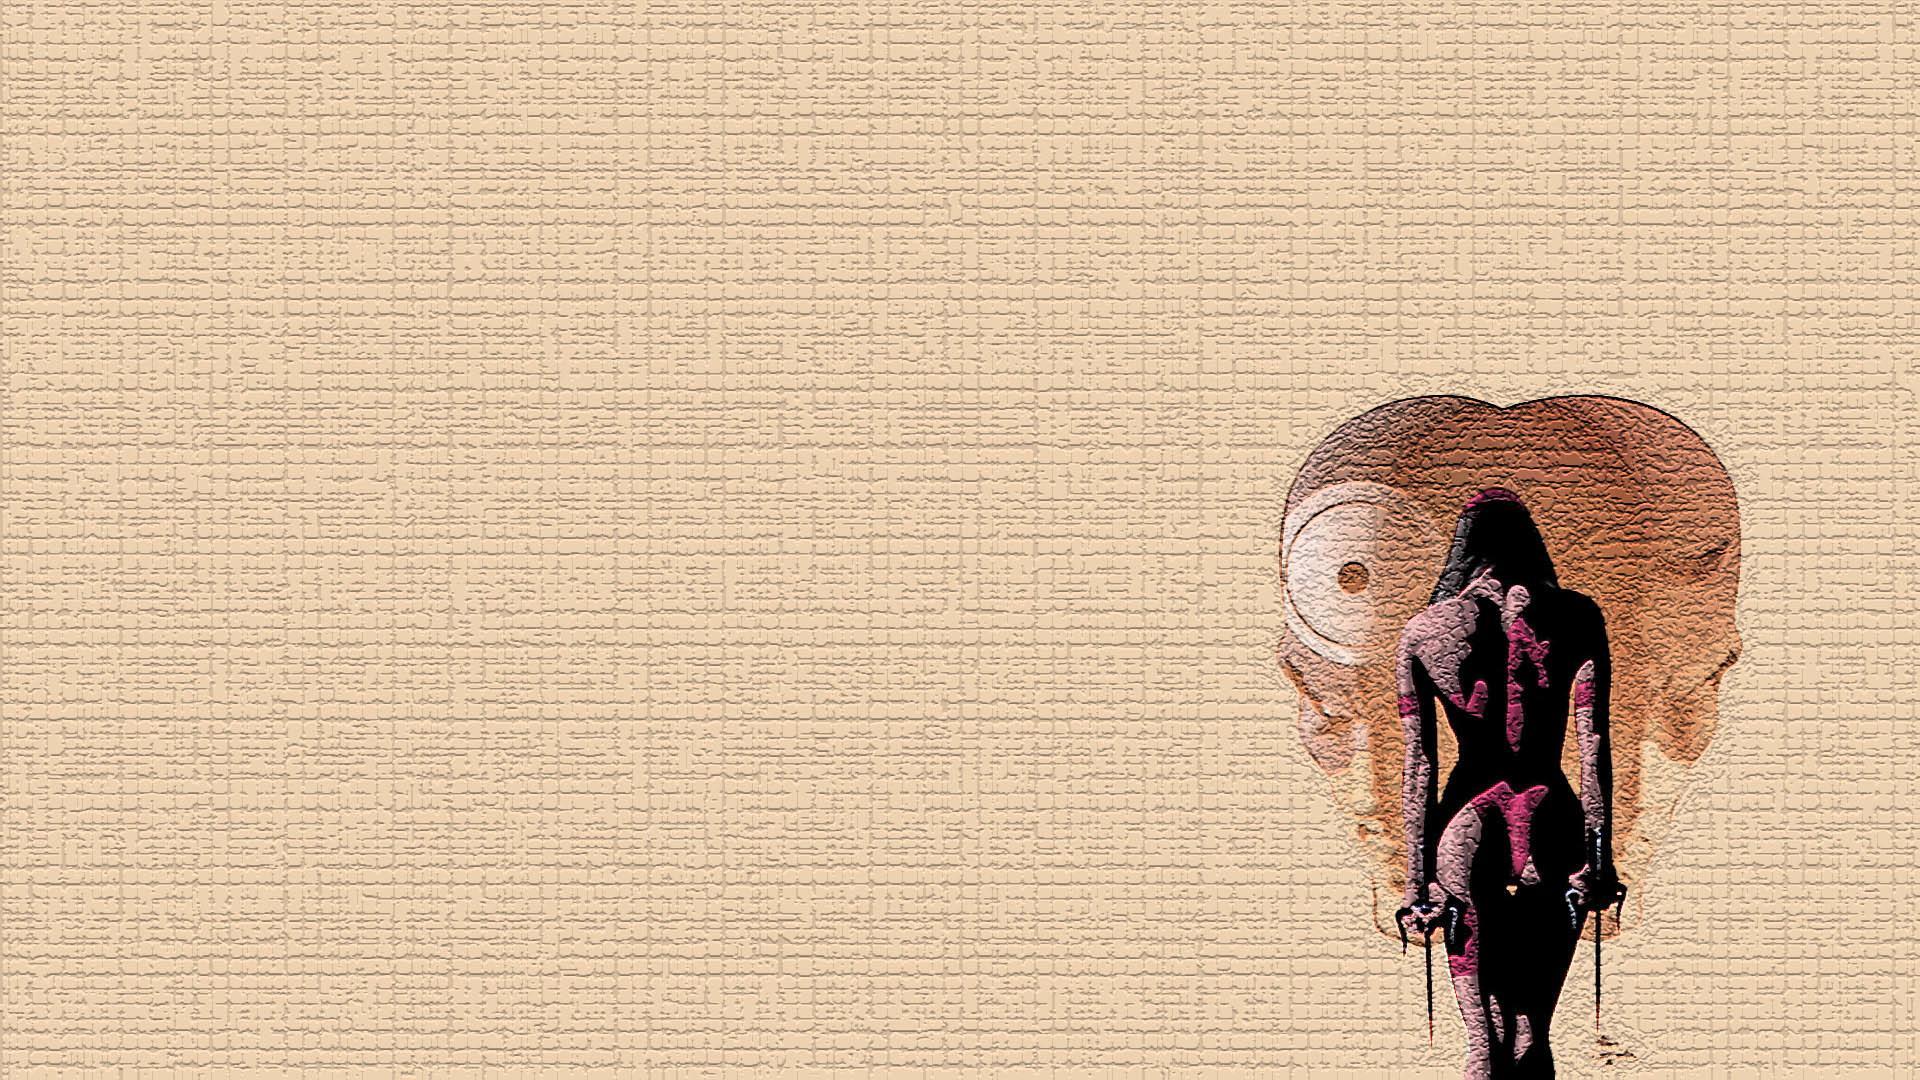 Bullseye Comics wallpapers HD quality